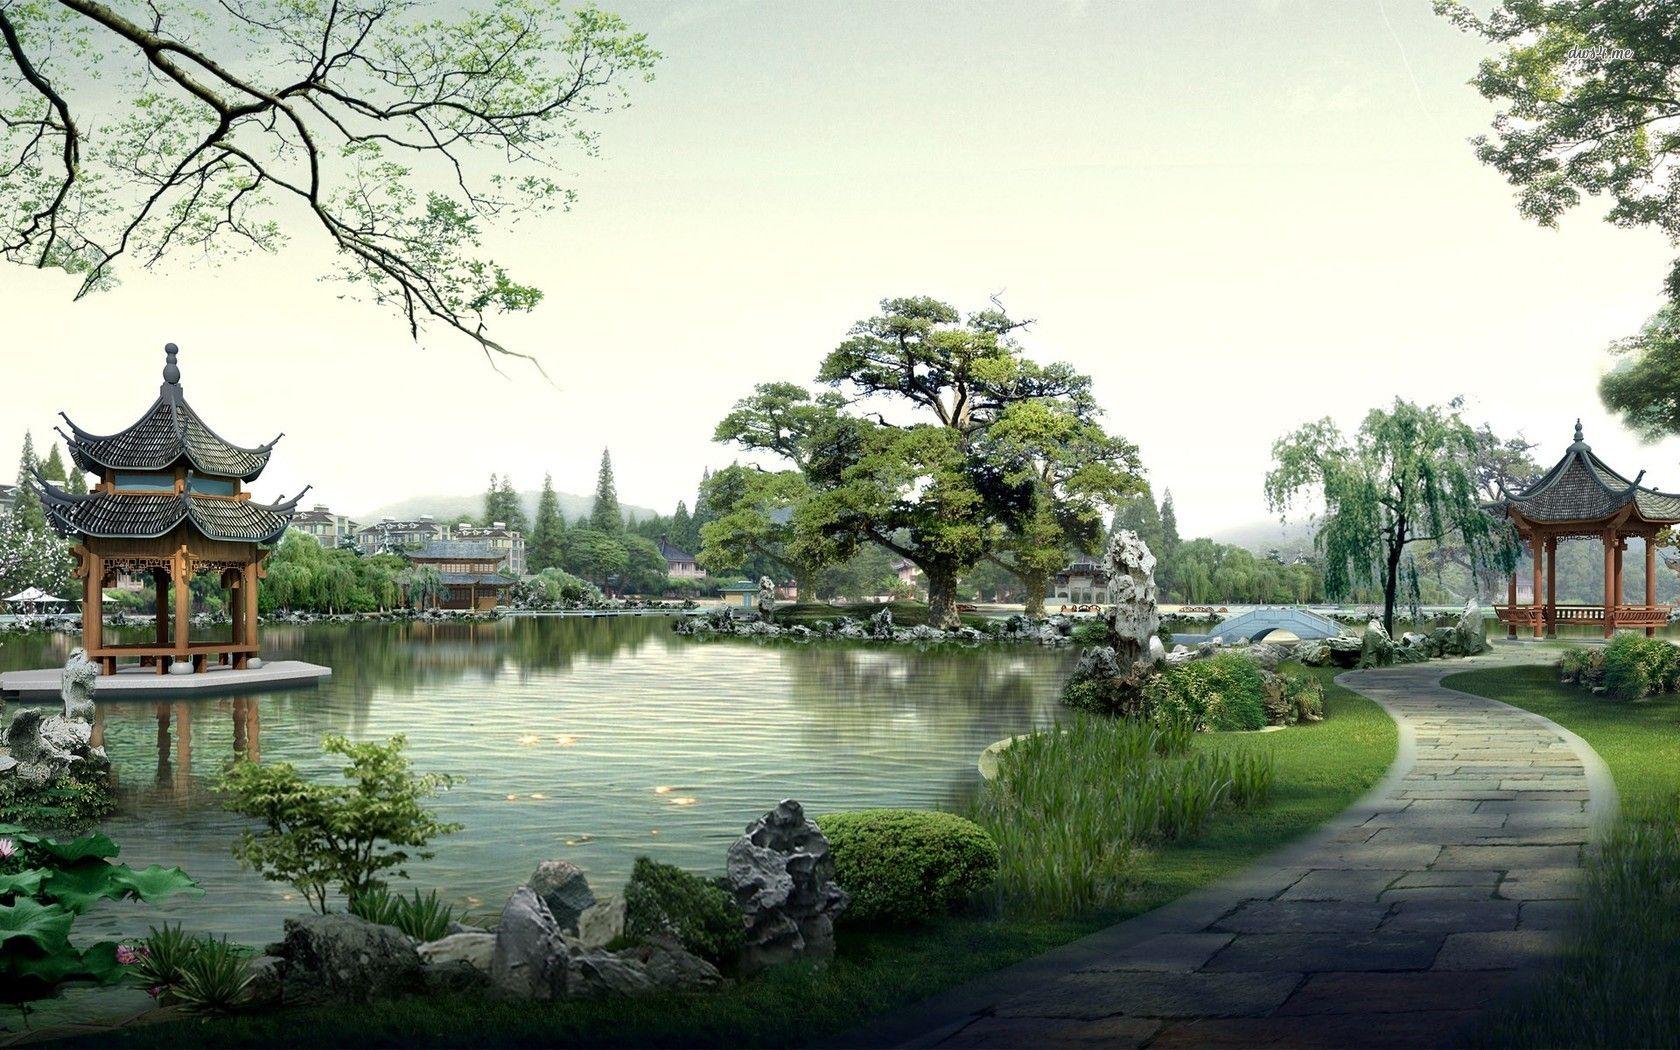 Wonderful Japan Digital Nature For Desktop Wallpapers With Japan